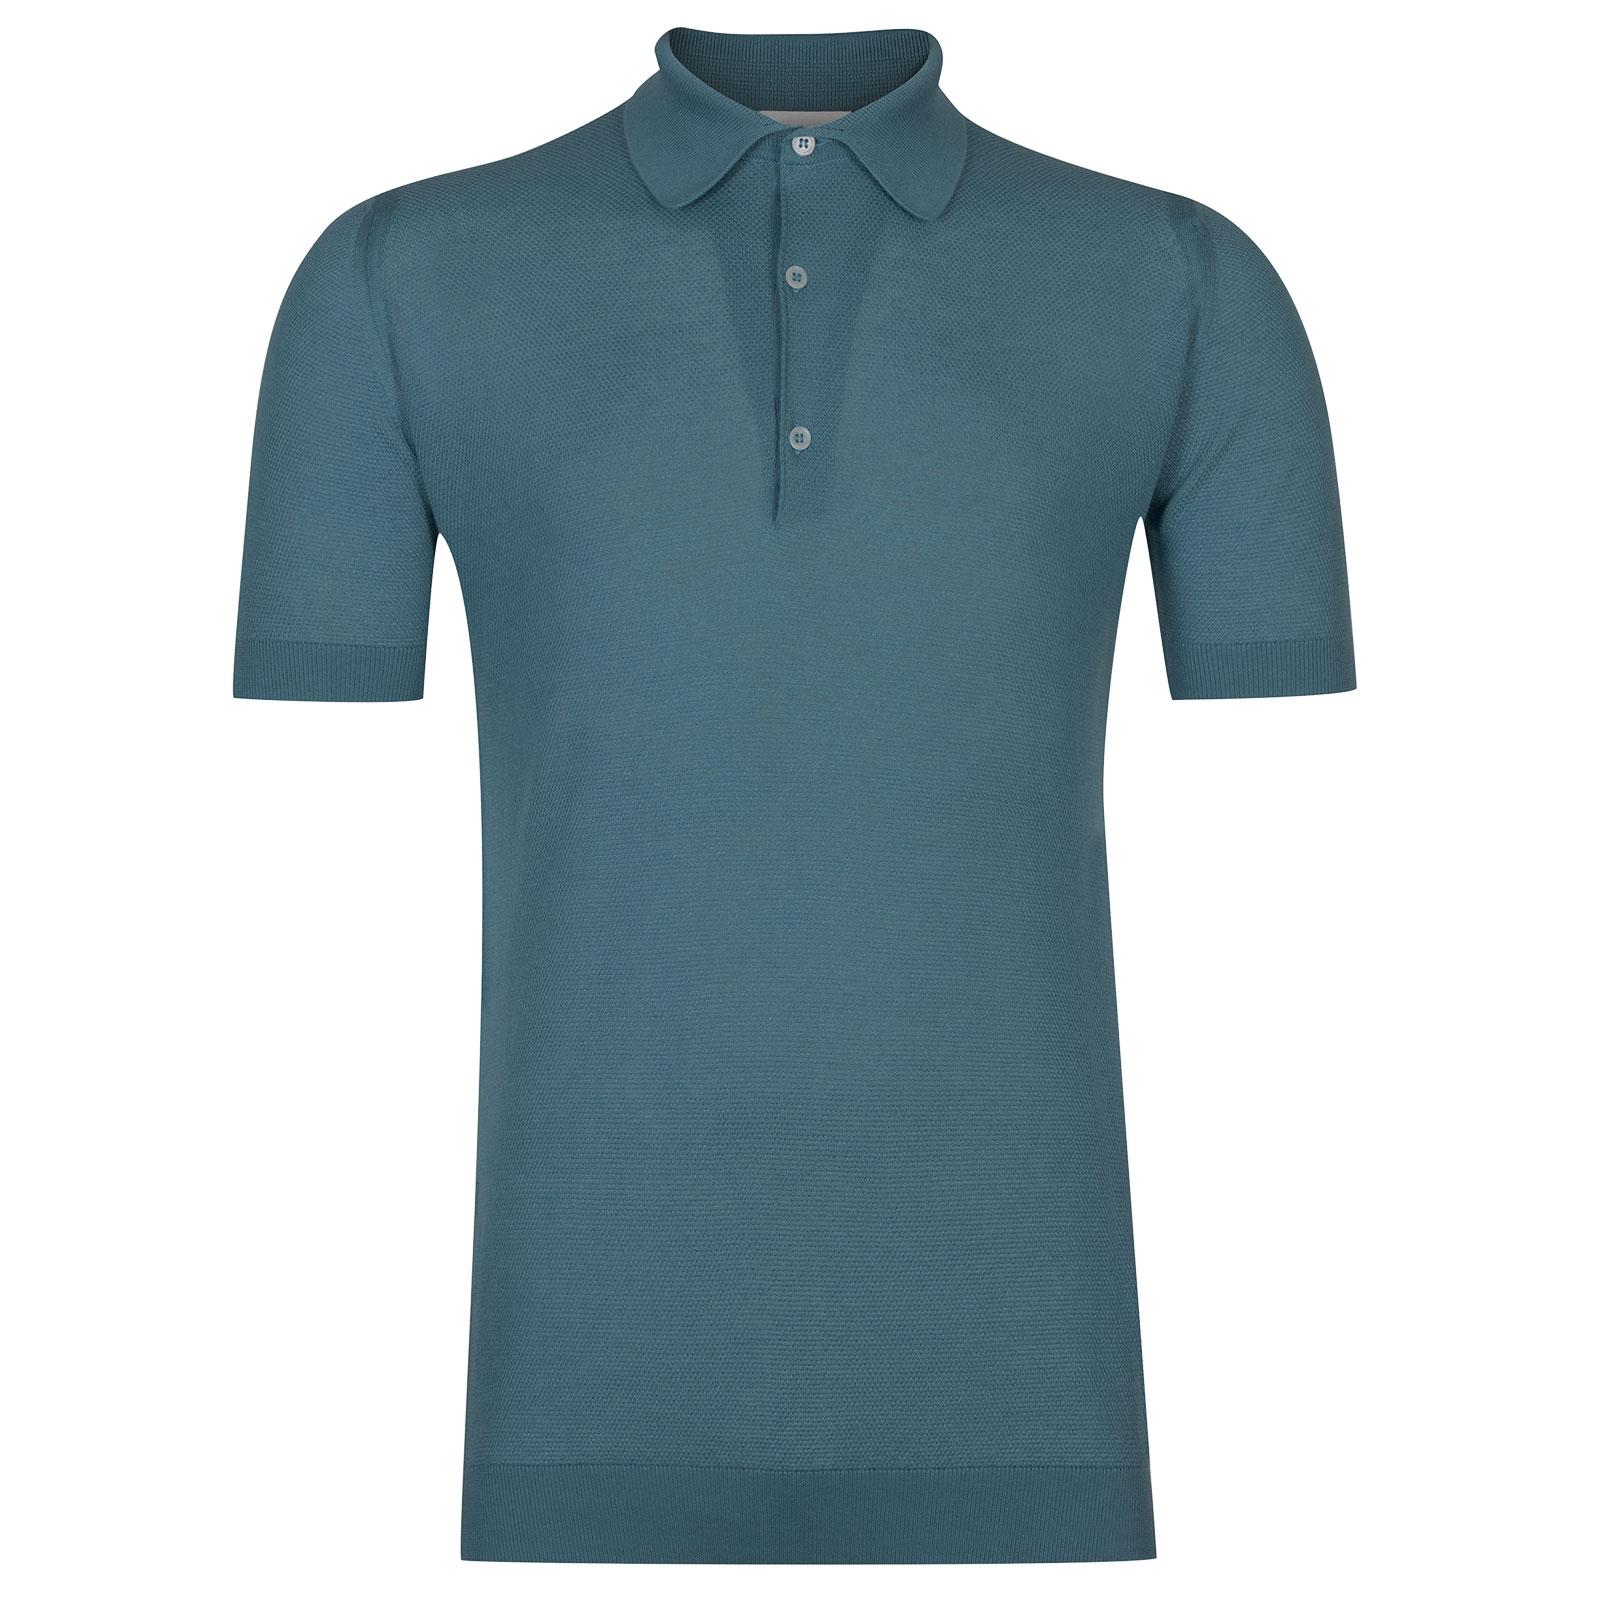 John Smedley Roth in Dewdrop Blue Shirt-MED